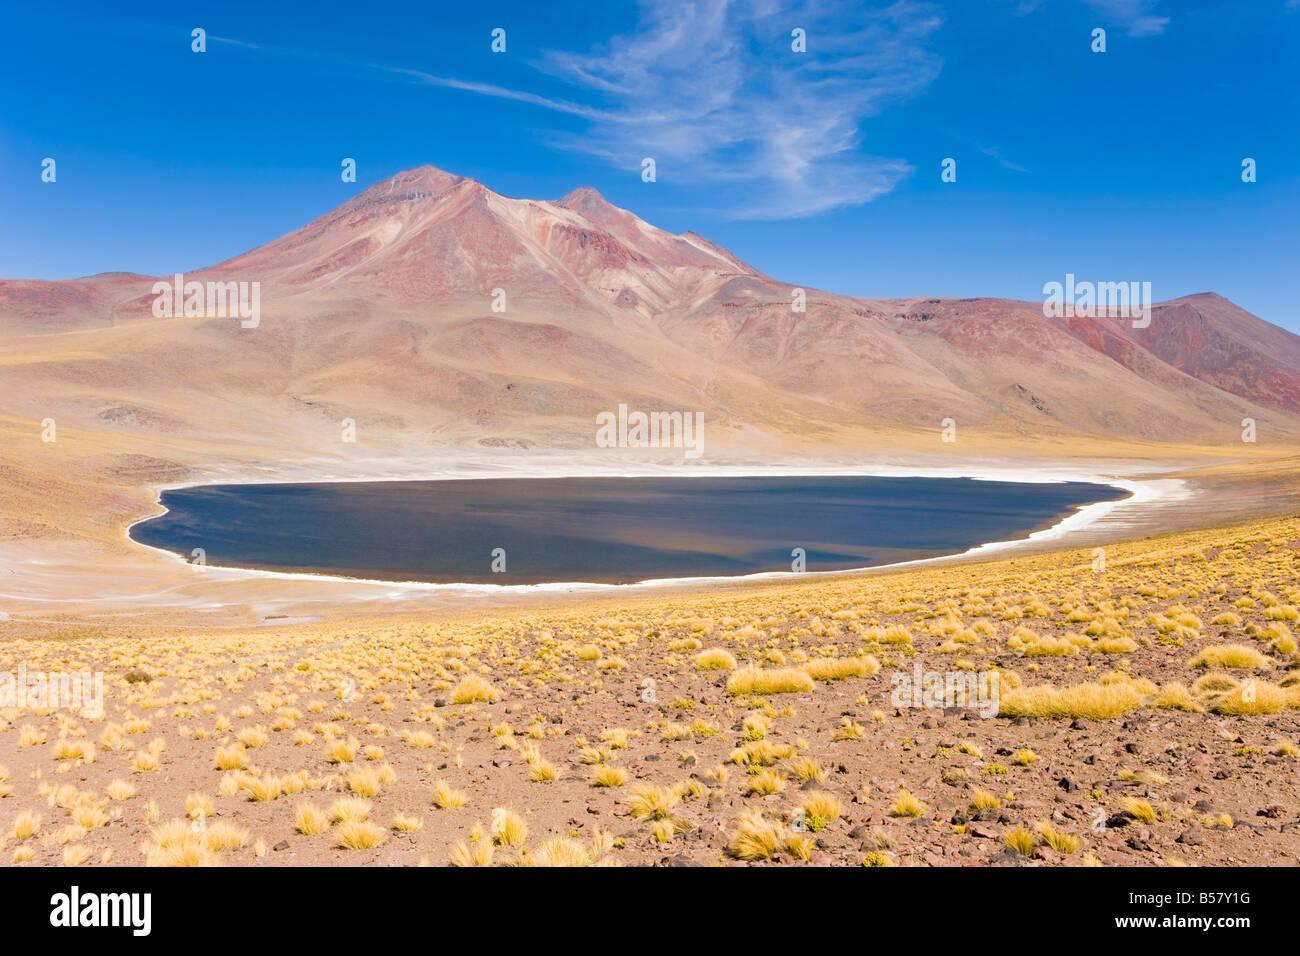 Laguna Miscanti, Los Flamencos National Reserve, Atacama Desert, Antofagasta Region, Chile - Stock Image